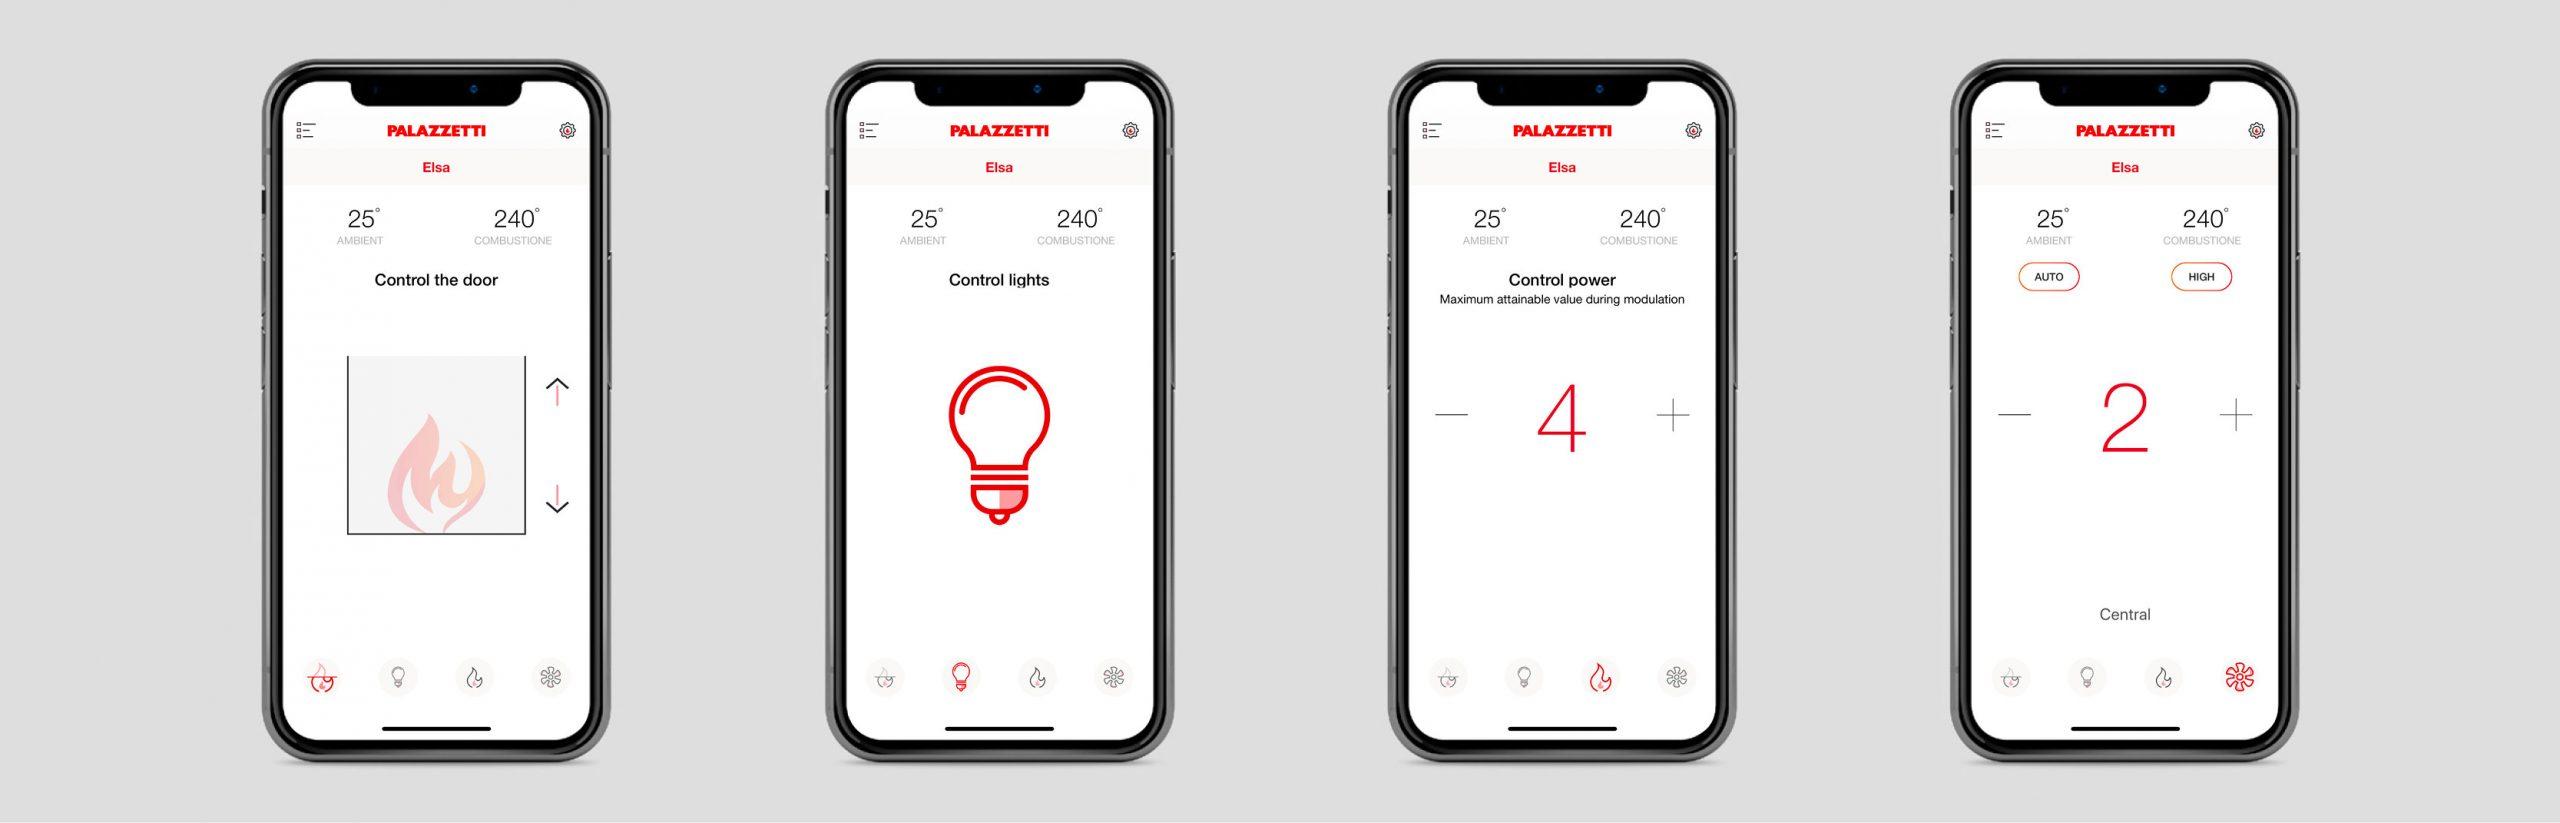 palazzetti-app-7